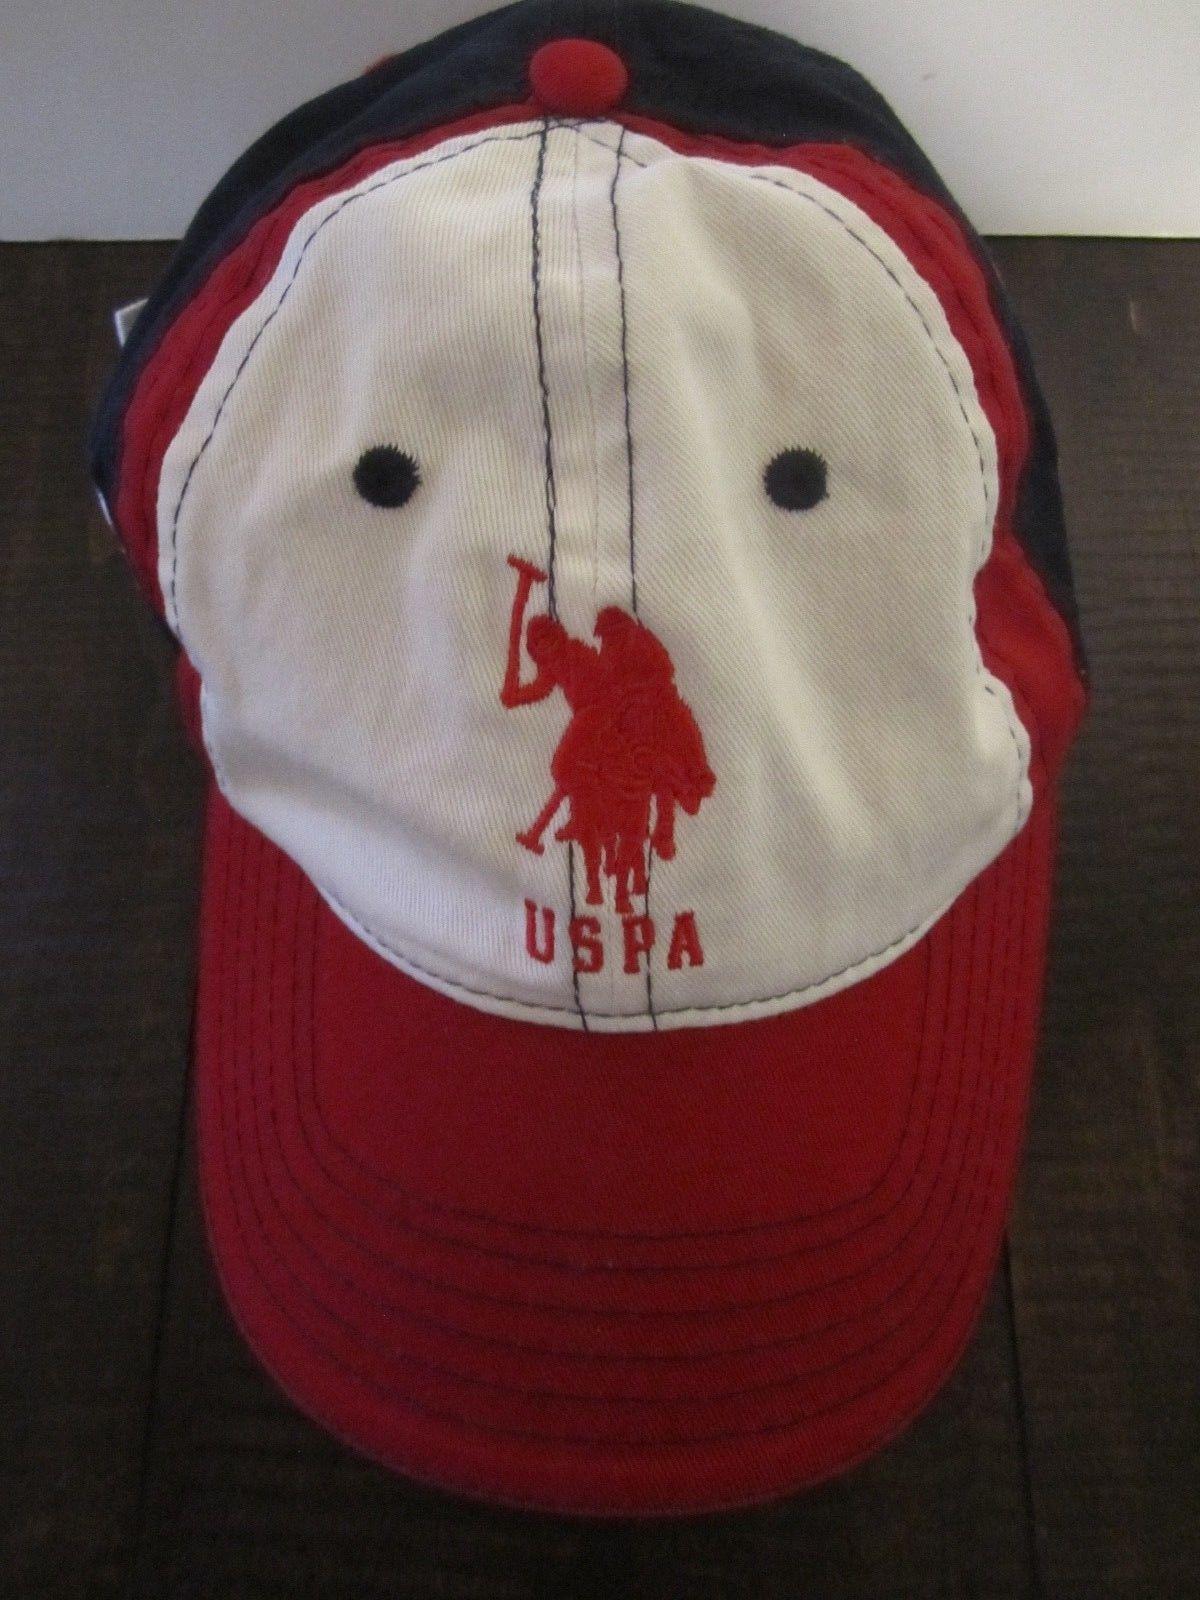 2904e0bc91e72 Polo Ralph Lauren USA hat cap large pony and 49 similar items. S l1600